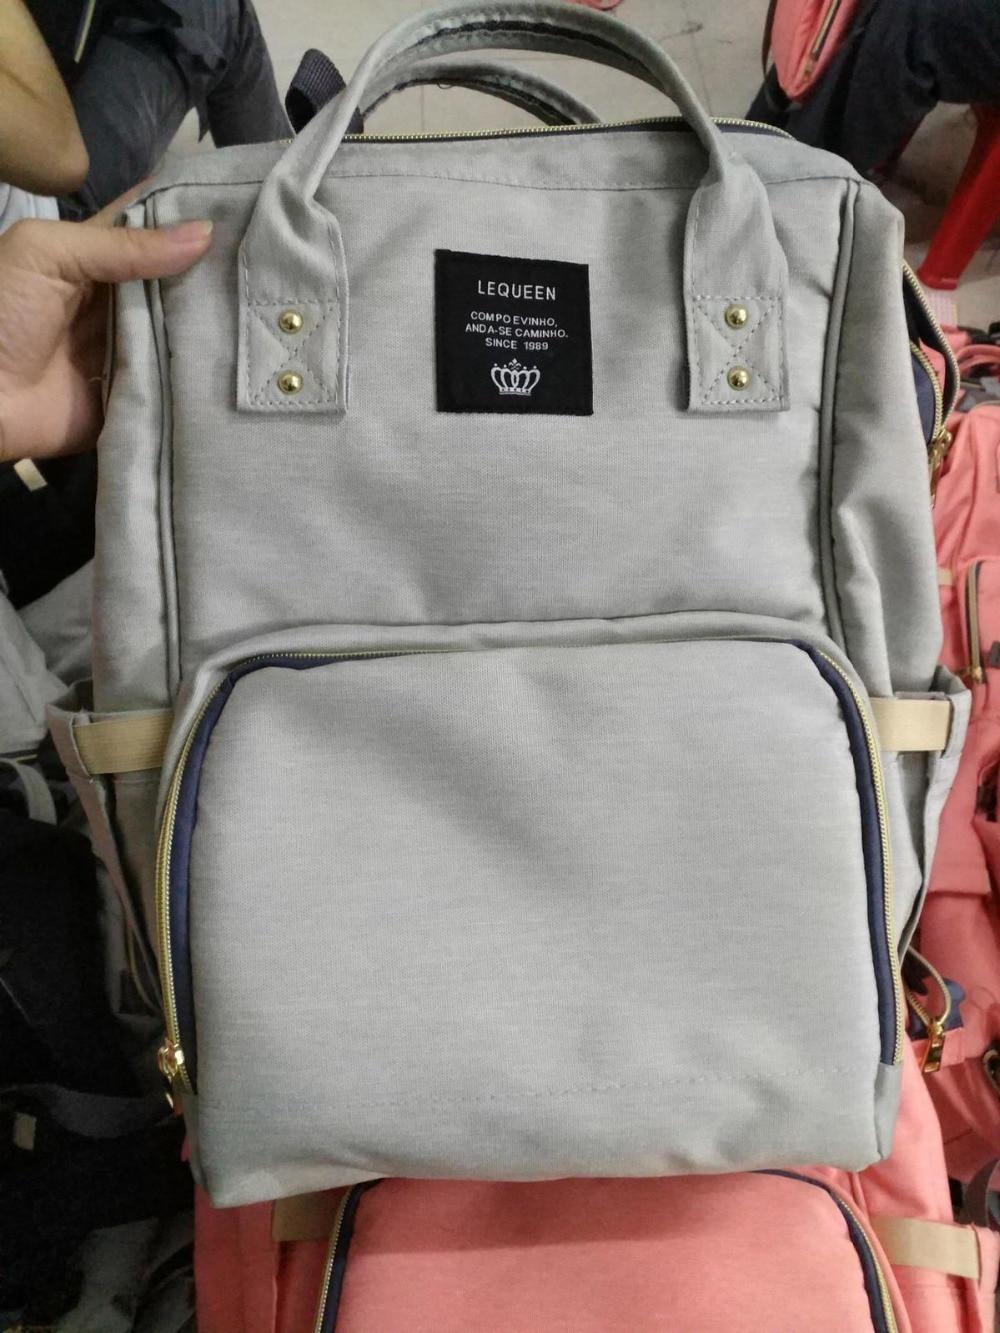 HTB14ct2bsvrK1Rjy0Feq6ATmVXaI Drop Shipping Lequeen Nursing Care Baby Bag Stripe Diaper Bag Nappy Bag Organizer Waterproof Maternity Bag